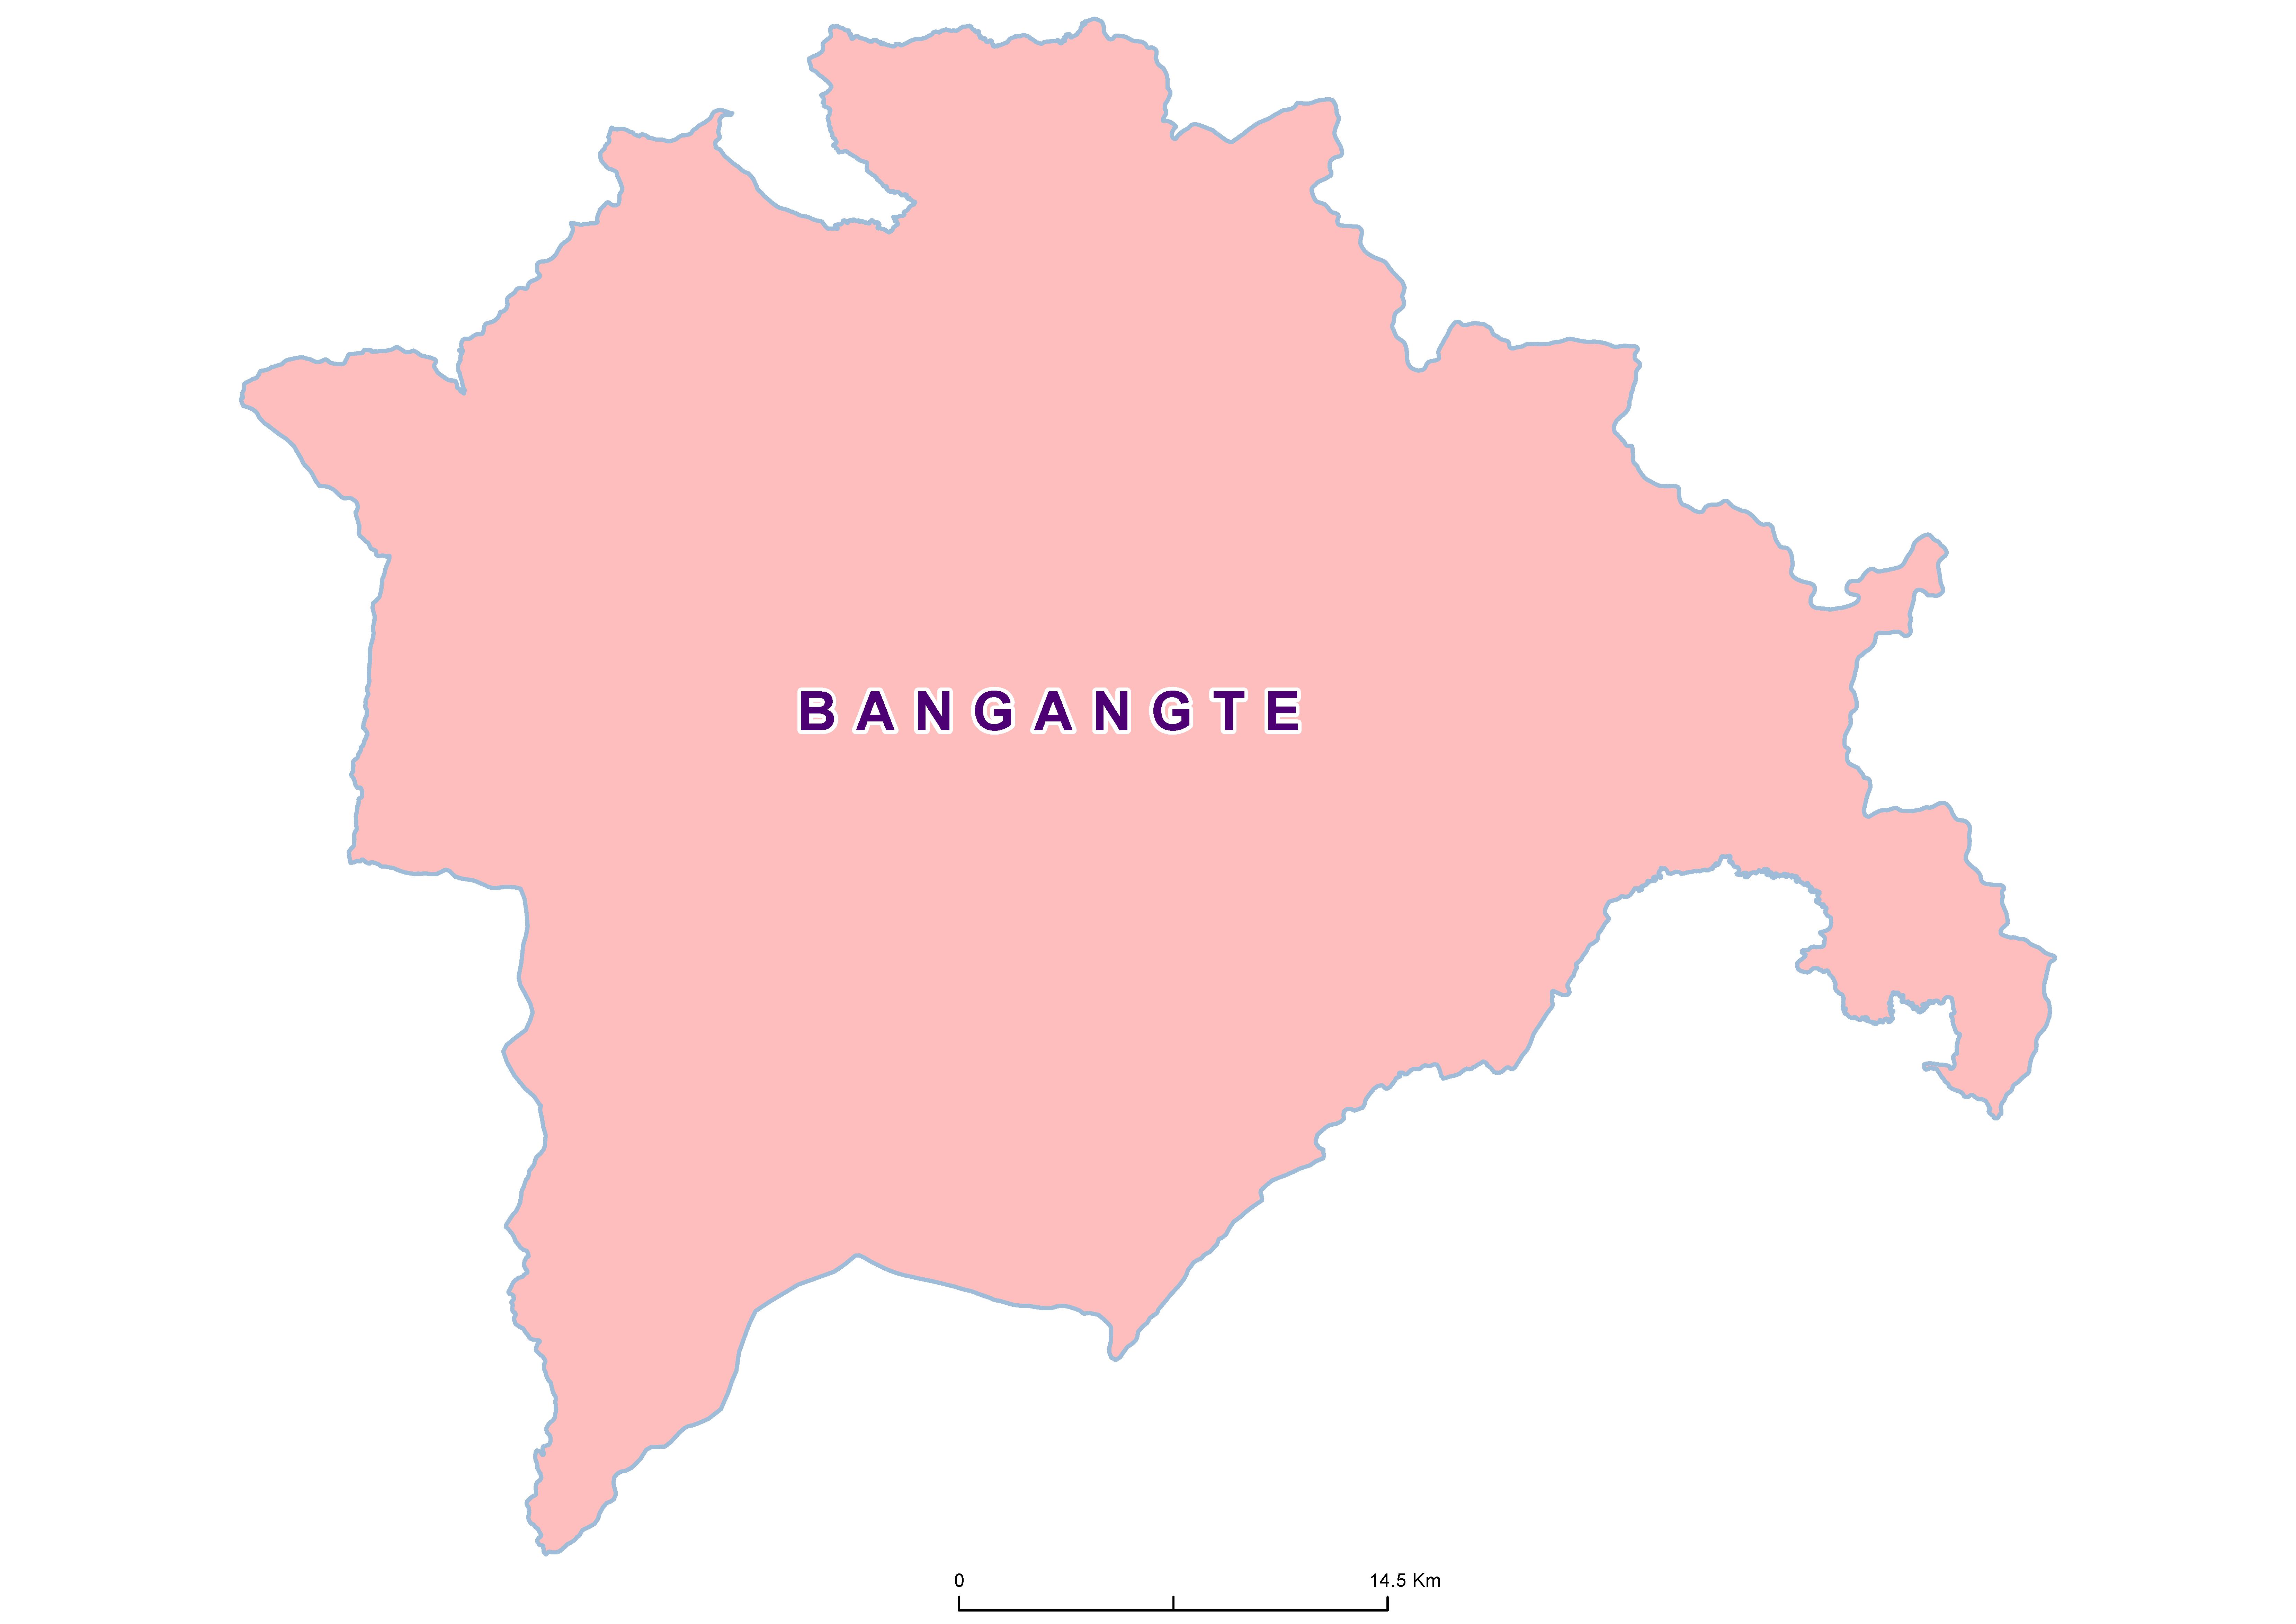 Bangangte Mean SCH 19850001